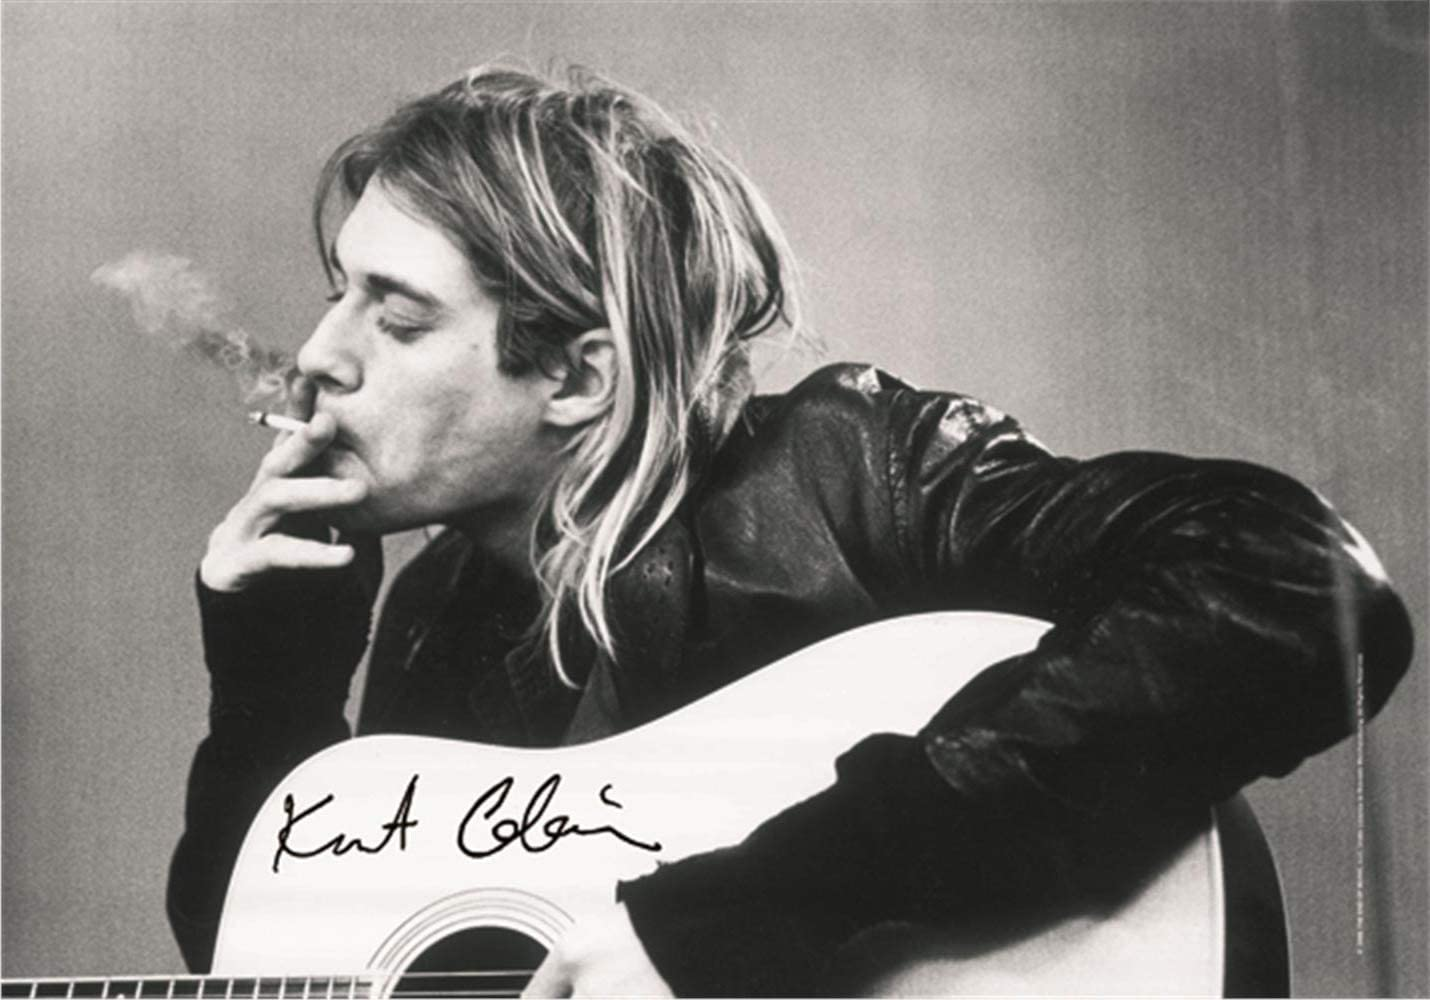 Heart Rock Licensed Bandera Kurt Cobain–B. & W Guitar, Tela, Multicolor, 110x 75x 0,1cm